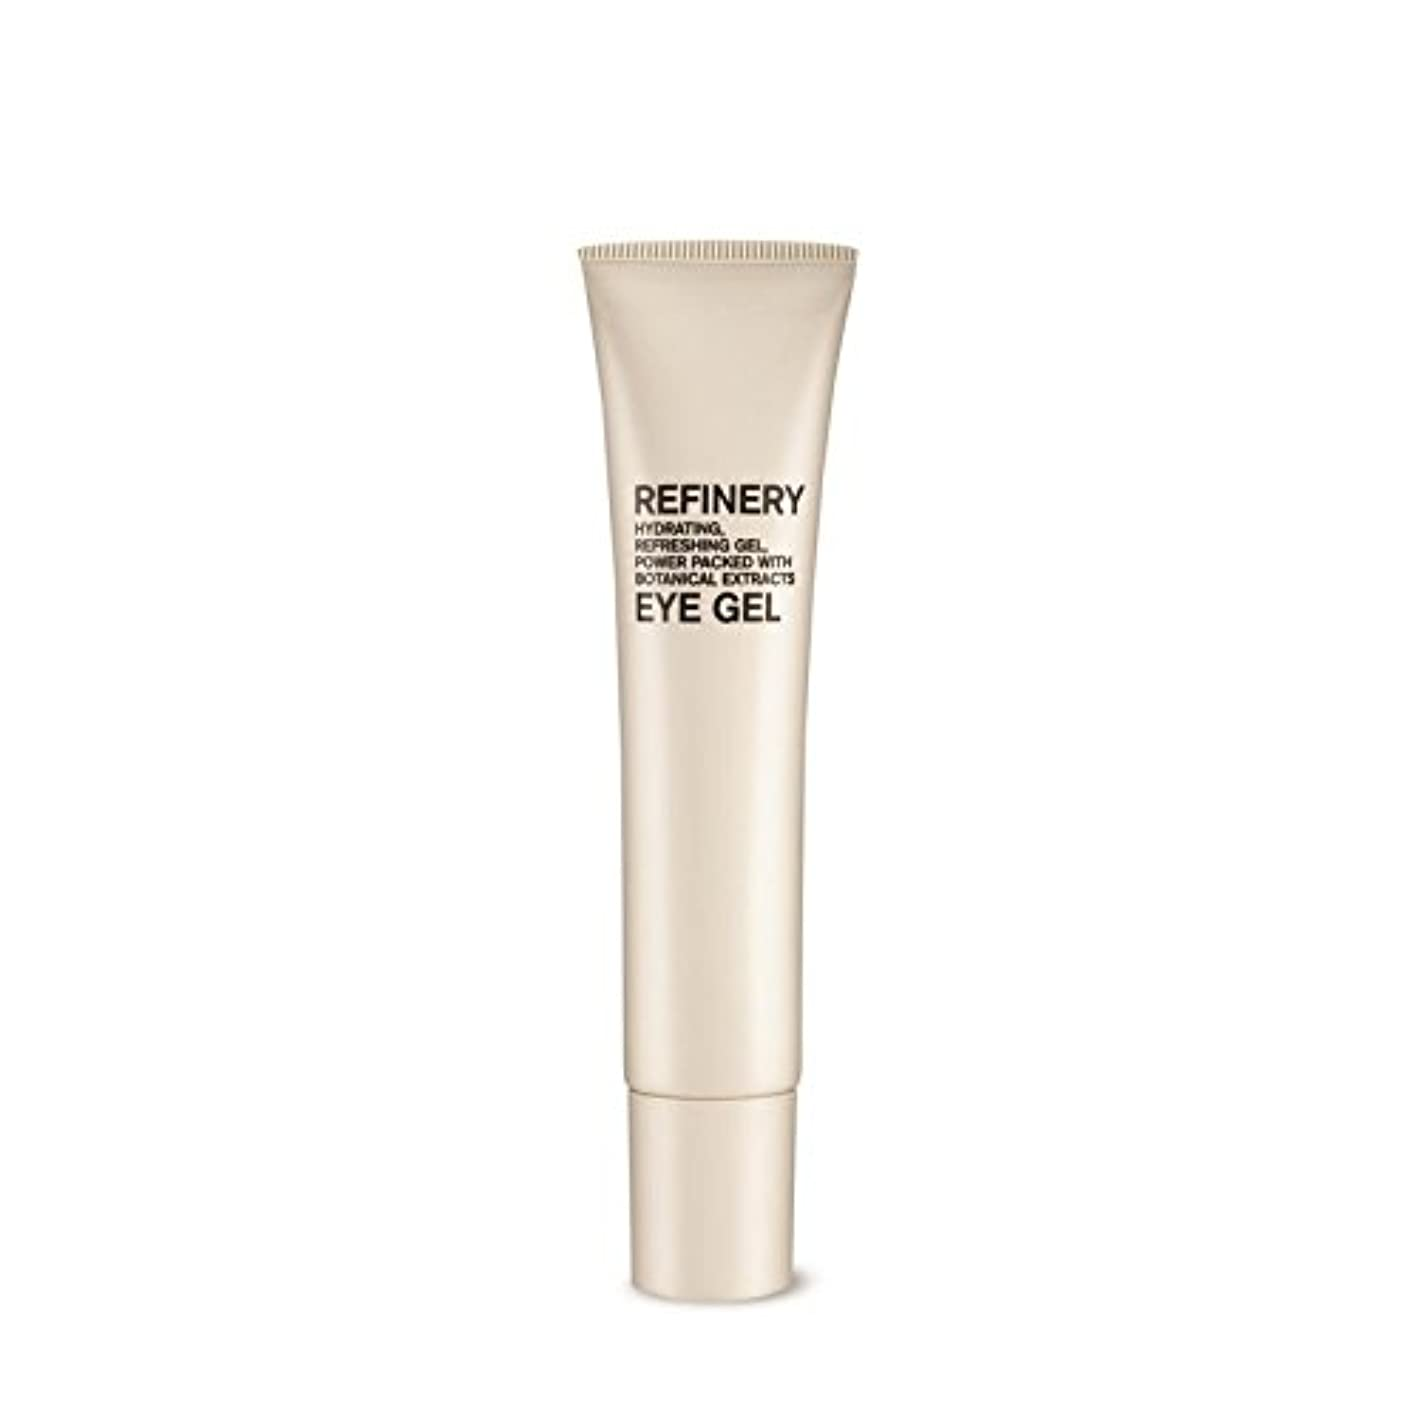 The Refinery Eye Gel 15ml (Pack of 6) - 製油所目ゲル15ミリリットル x6 [並行輸入品]